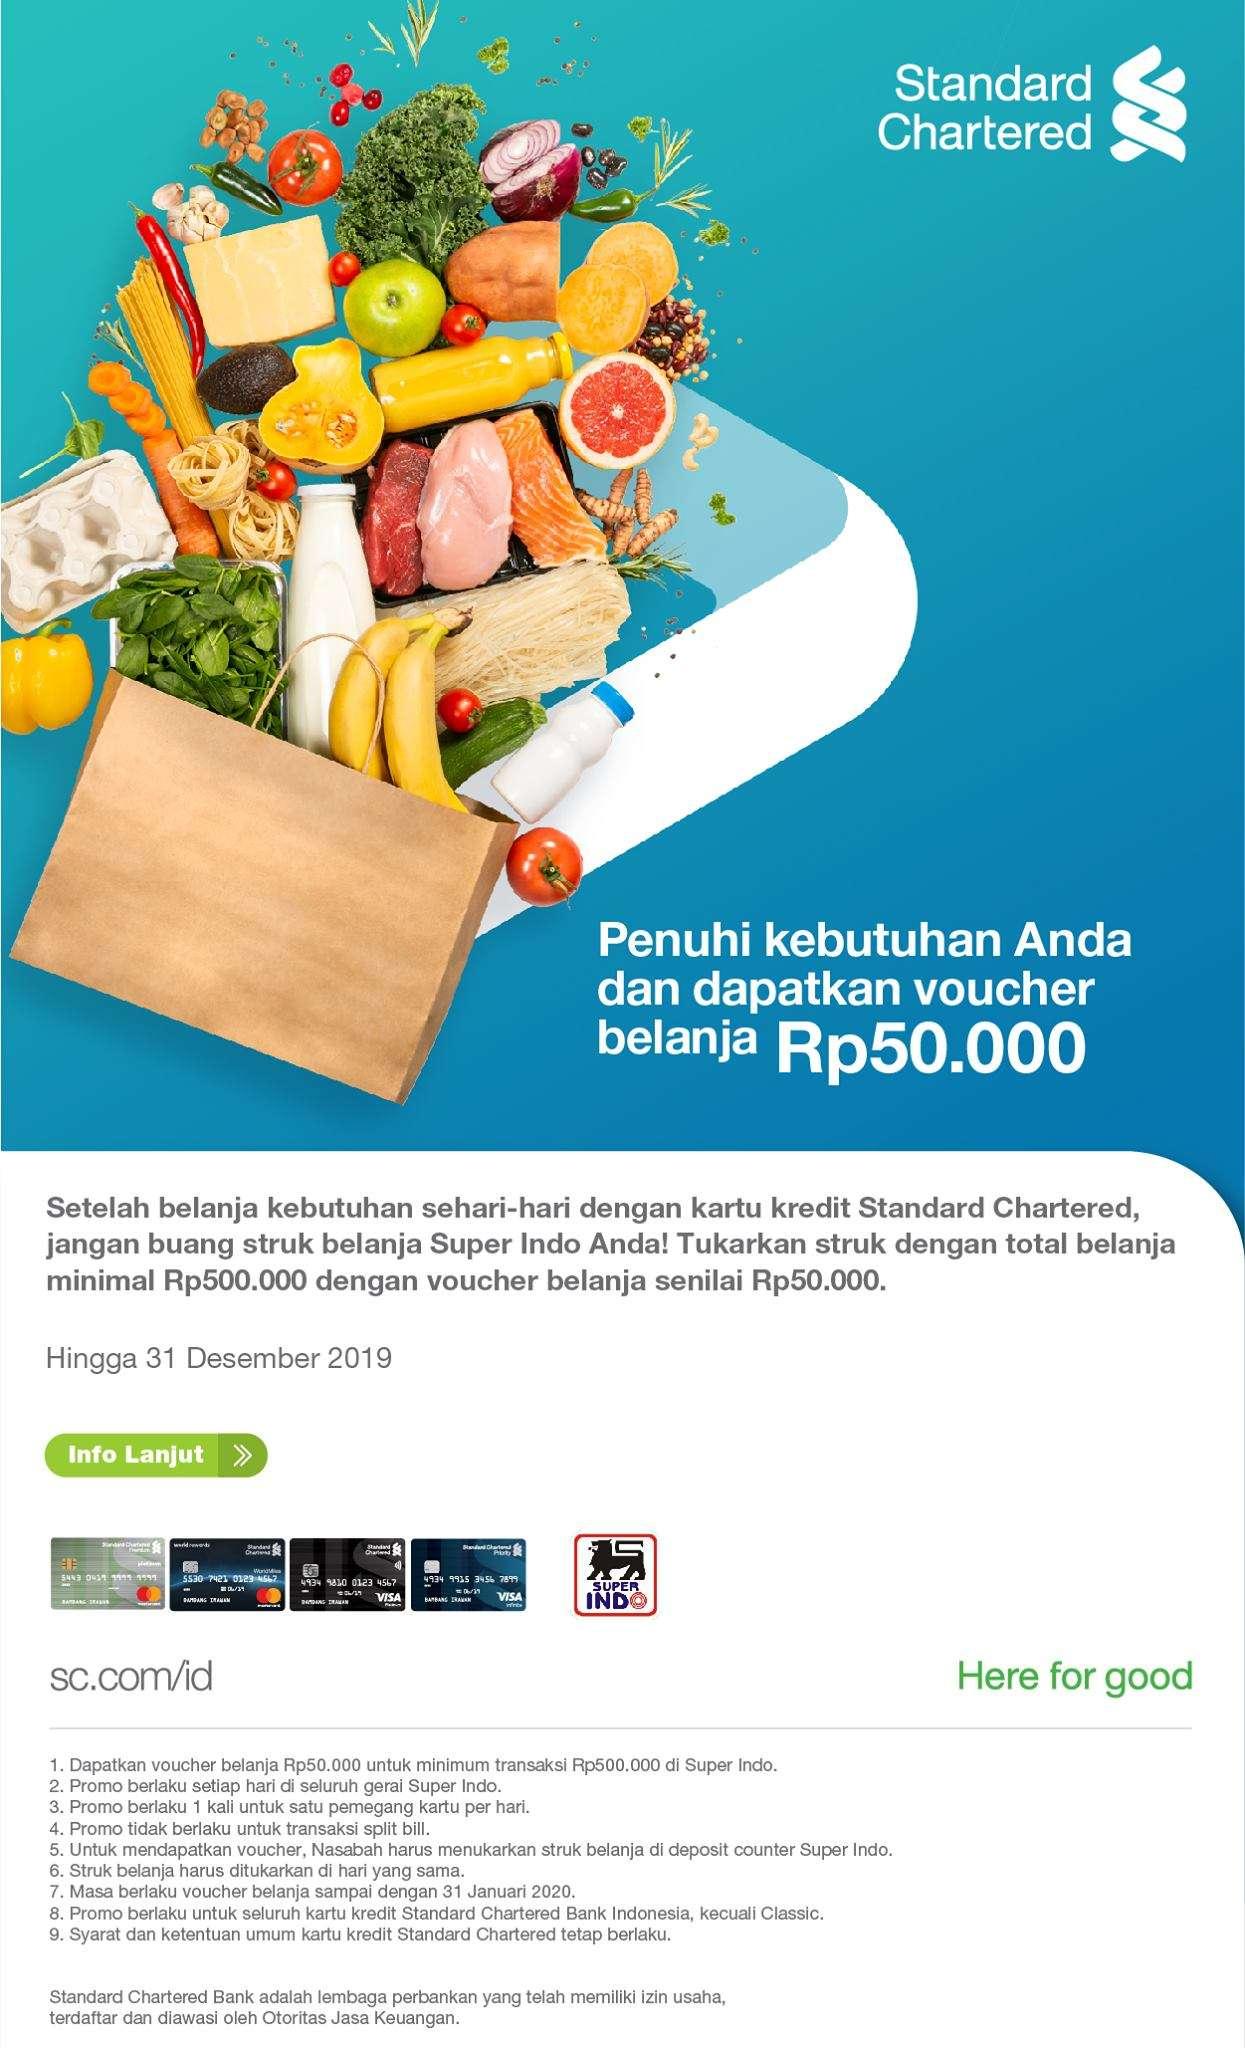 Superindo Promo Gratis Voucher Belanja Rp 50.000 Dengan Kartu Kredit Standard Chartered